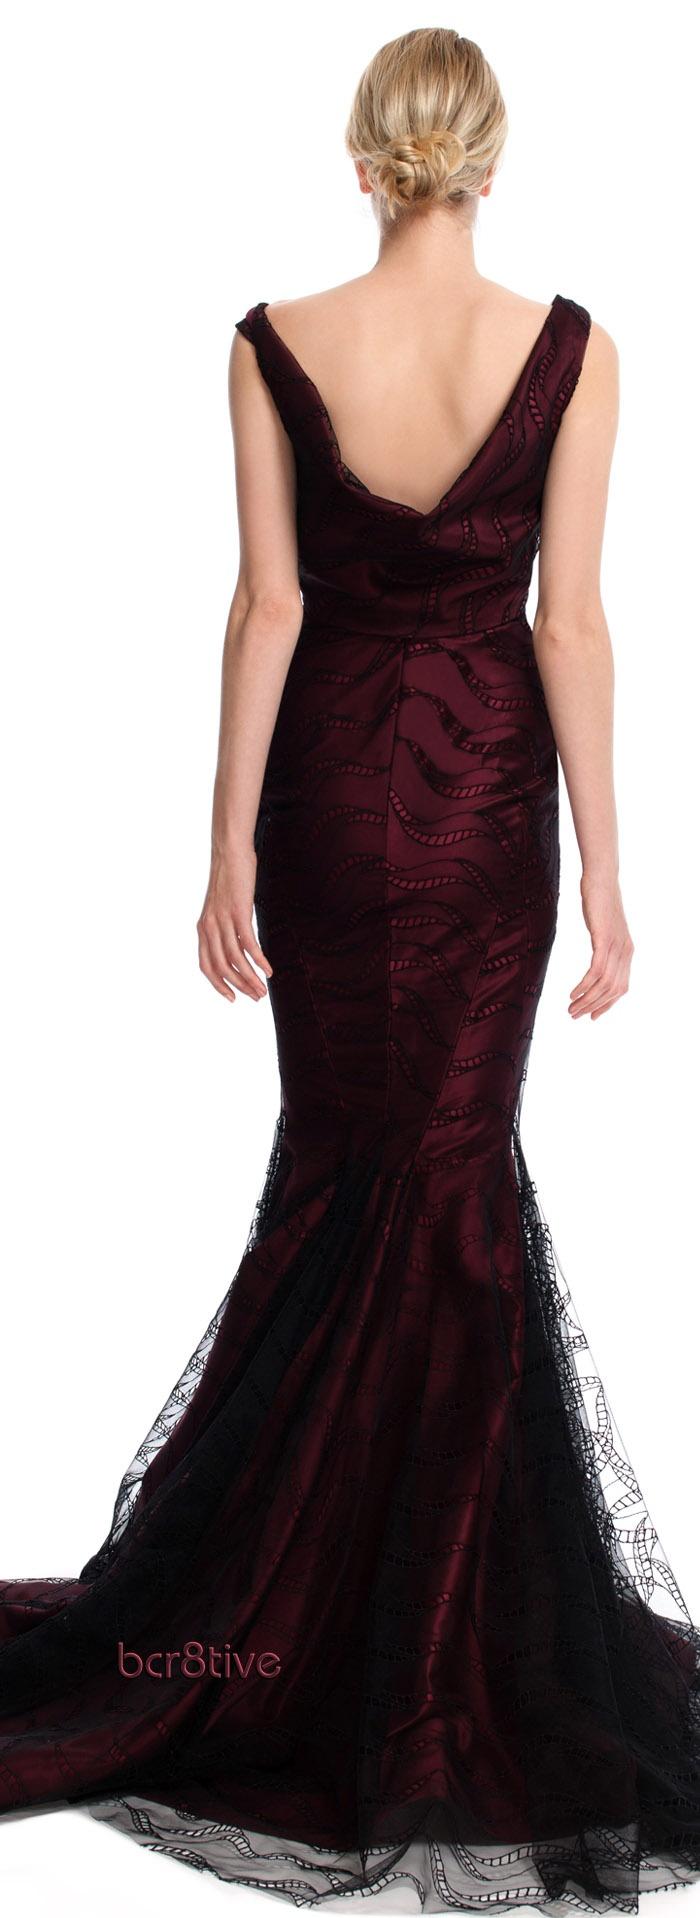 Zac Posen Bateau Neck Mermaid Evening Gown